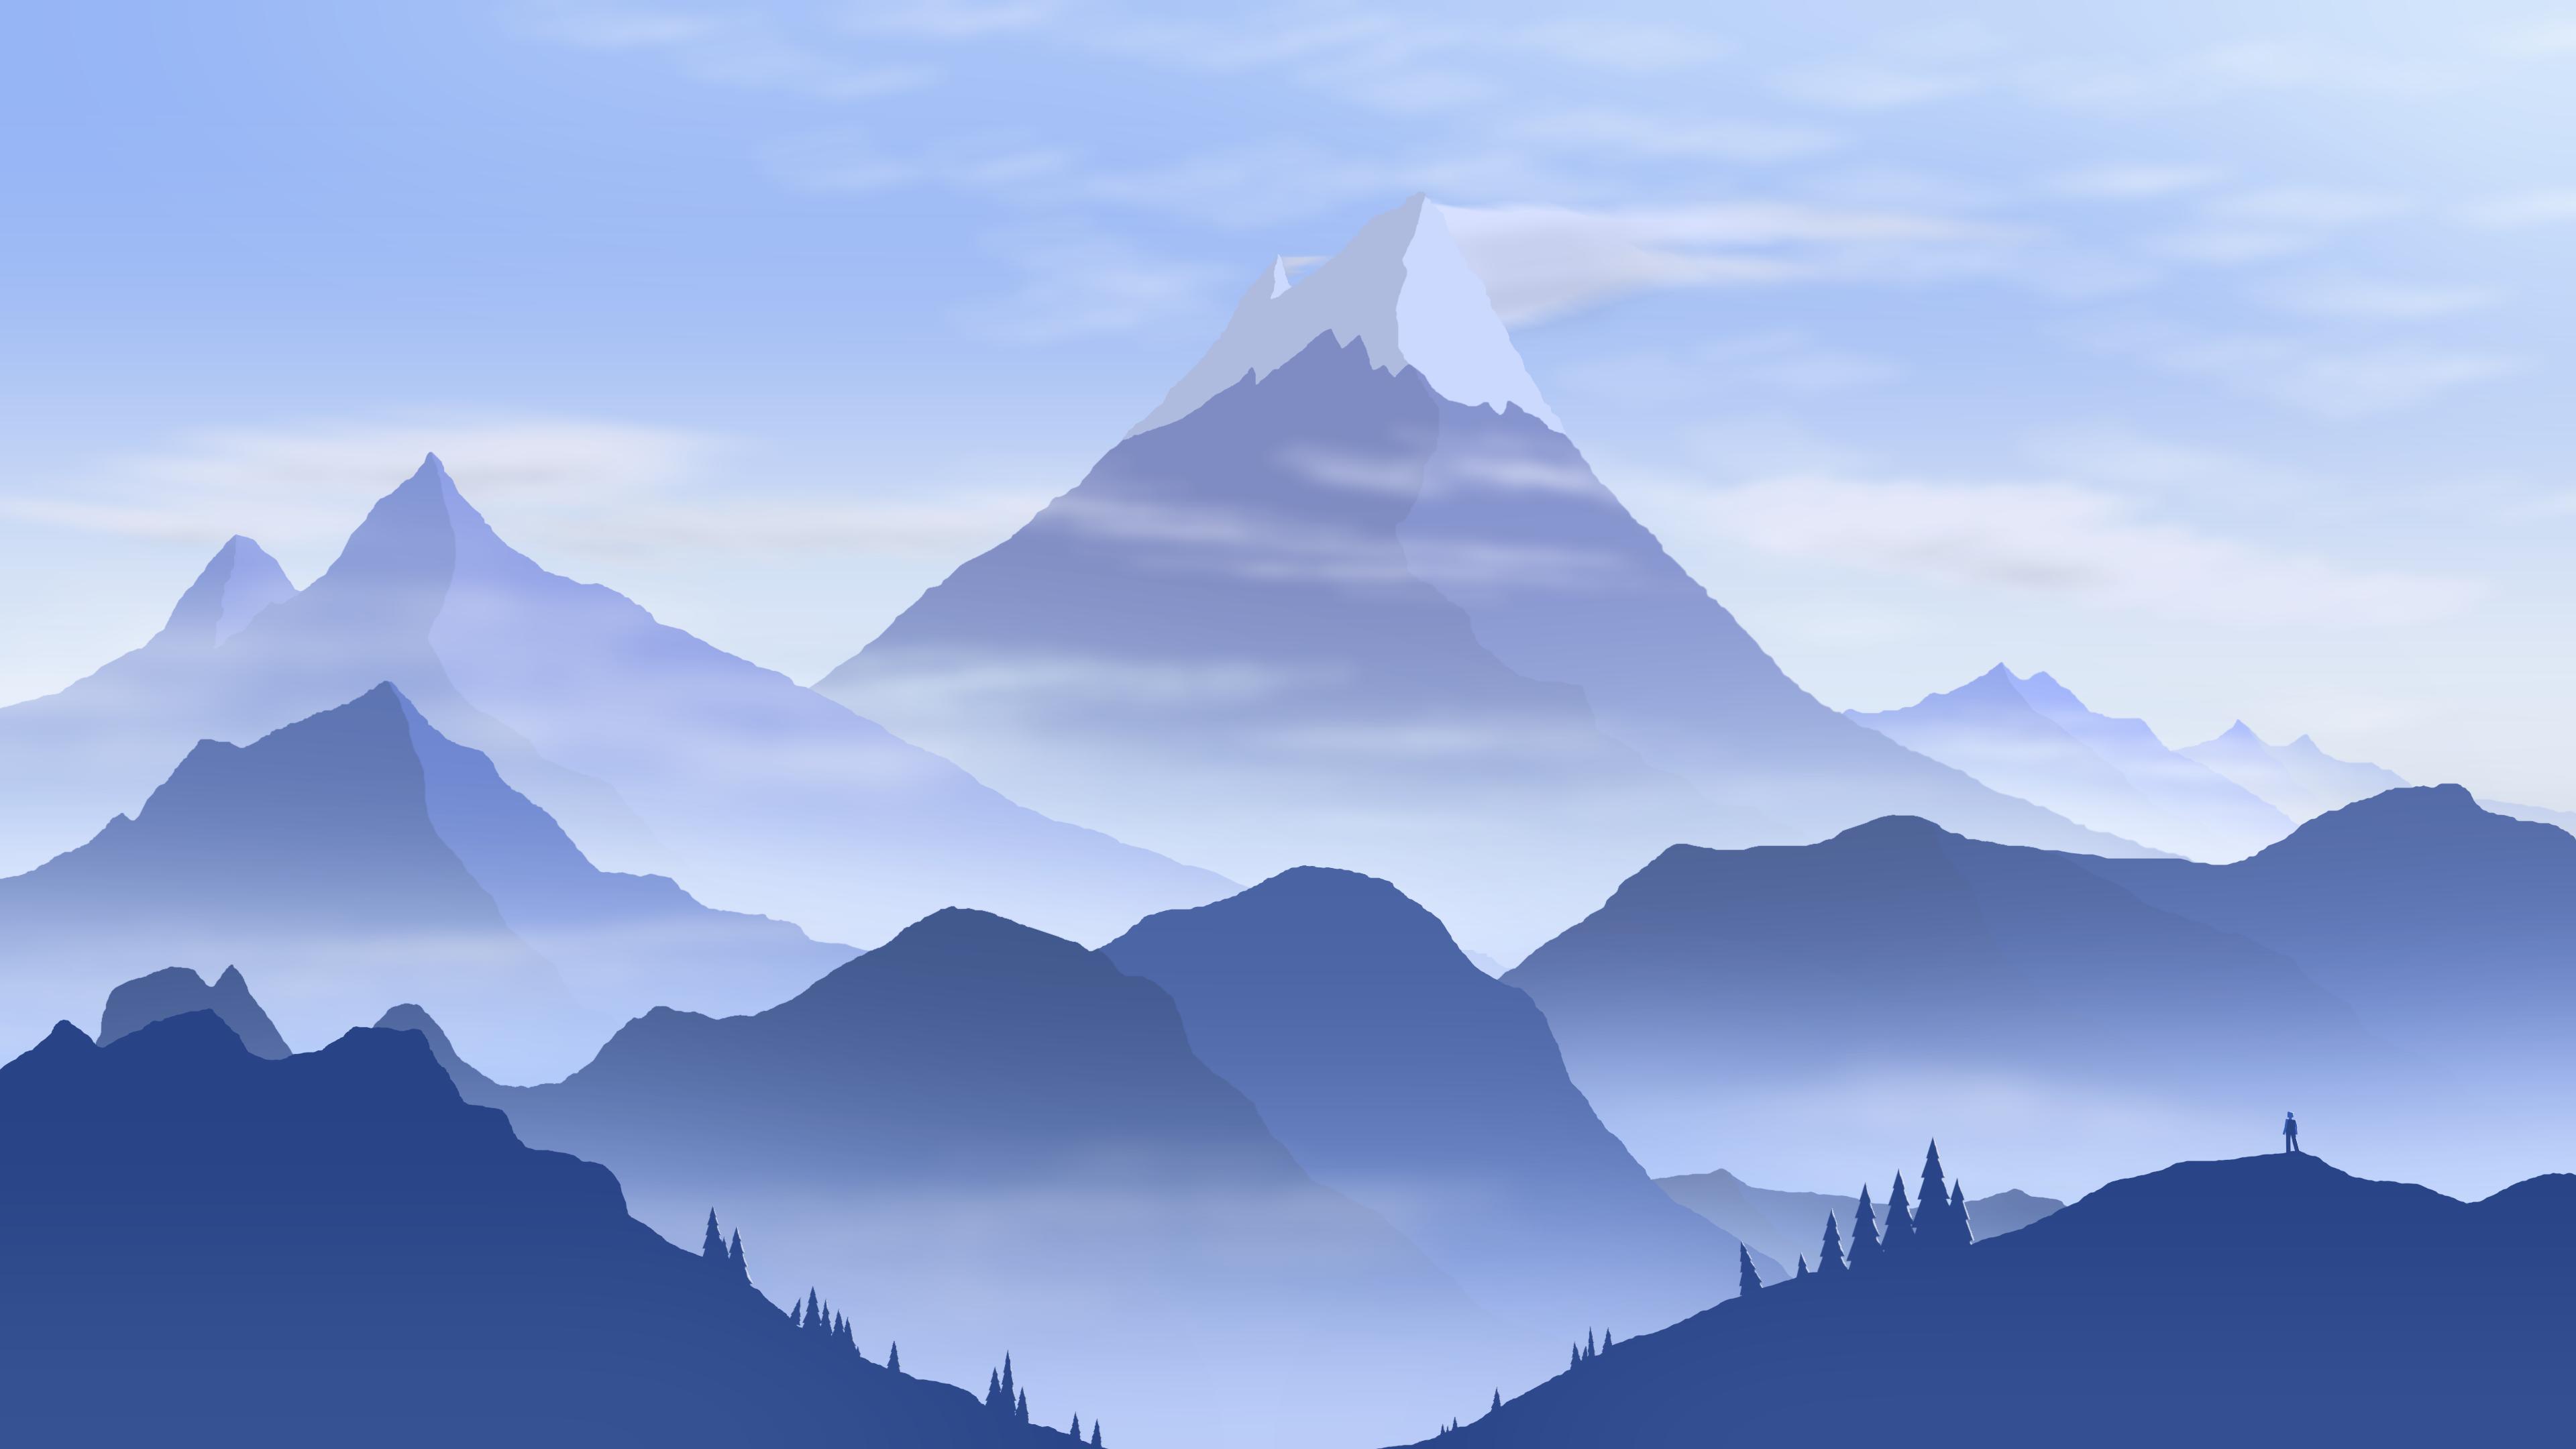 Mountain Wilderness 4k Ultra Hd Wallpaper Background Image 3840x2160 Id 1074975 Wallpaper Abyss